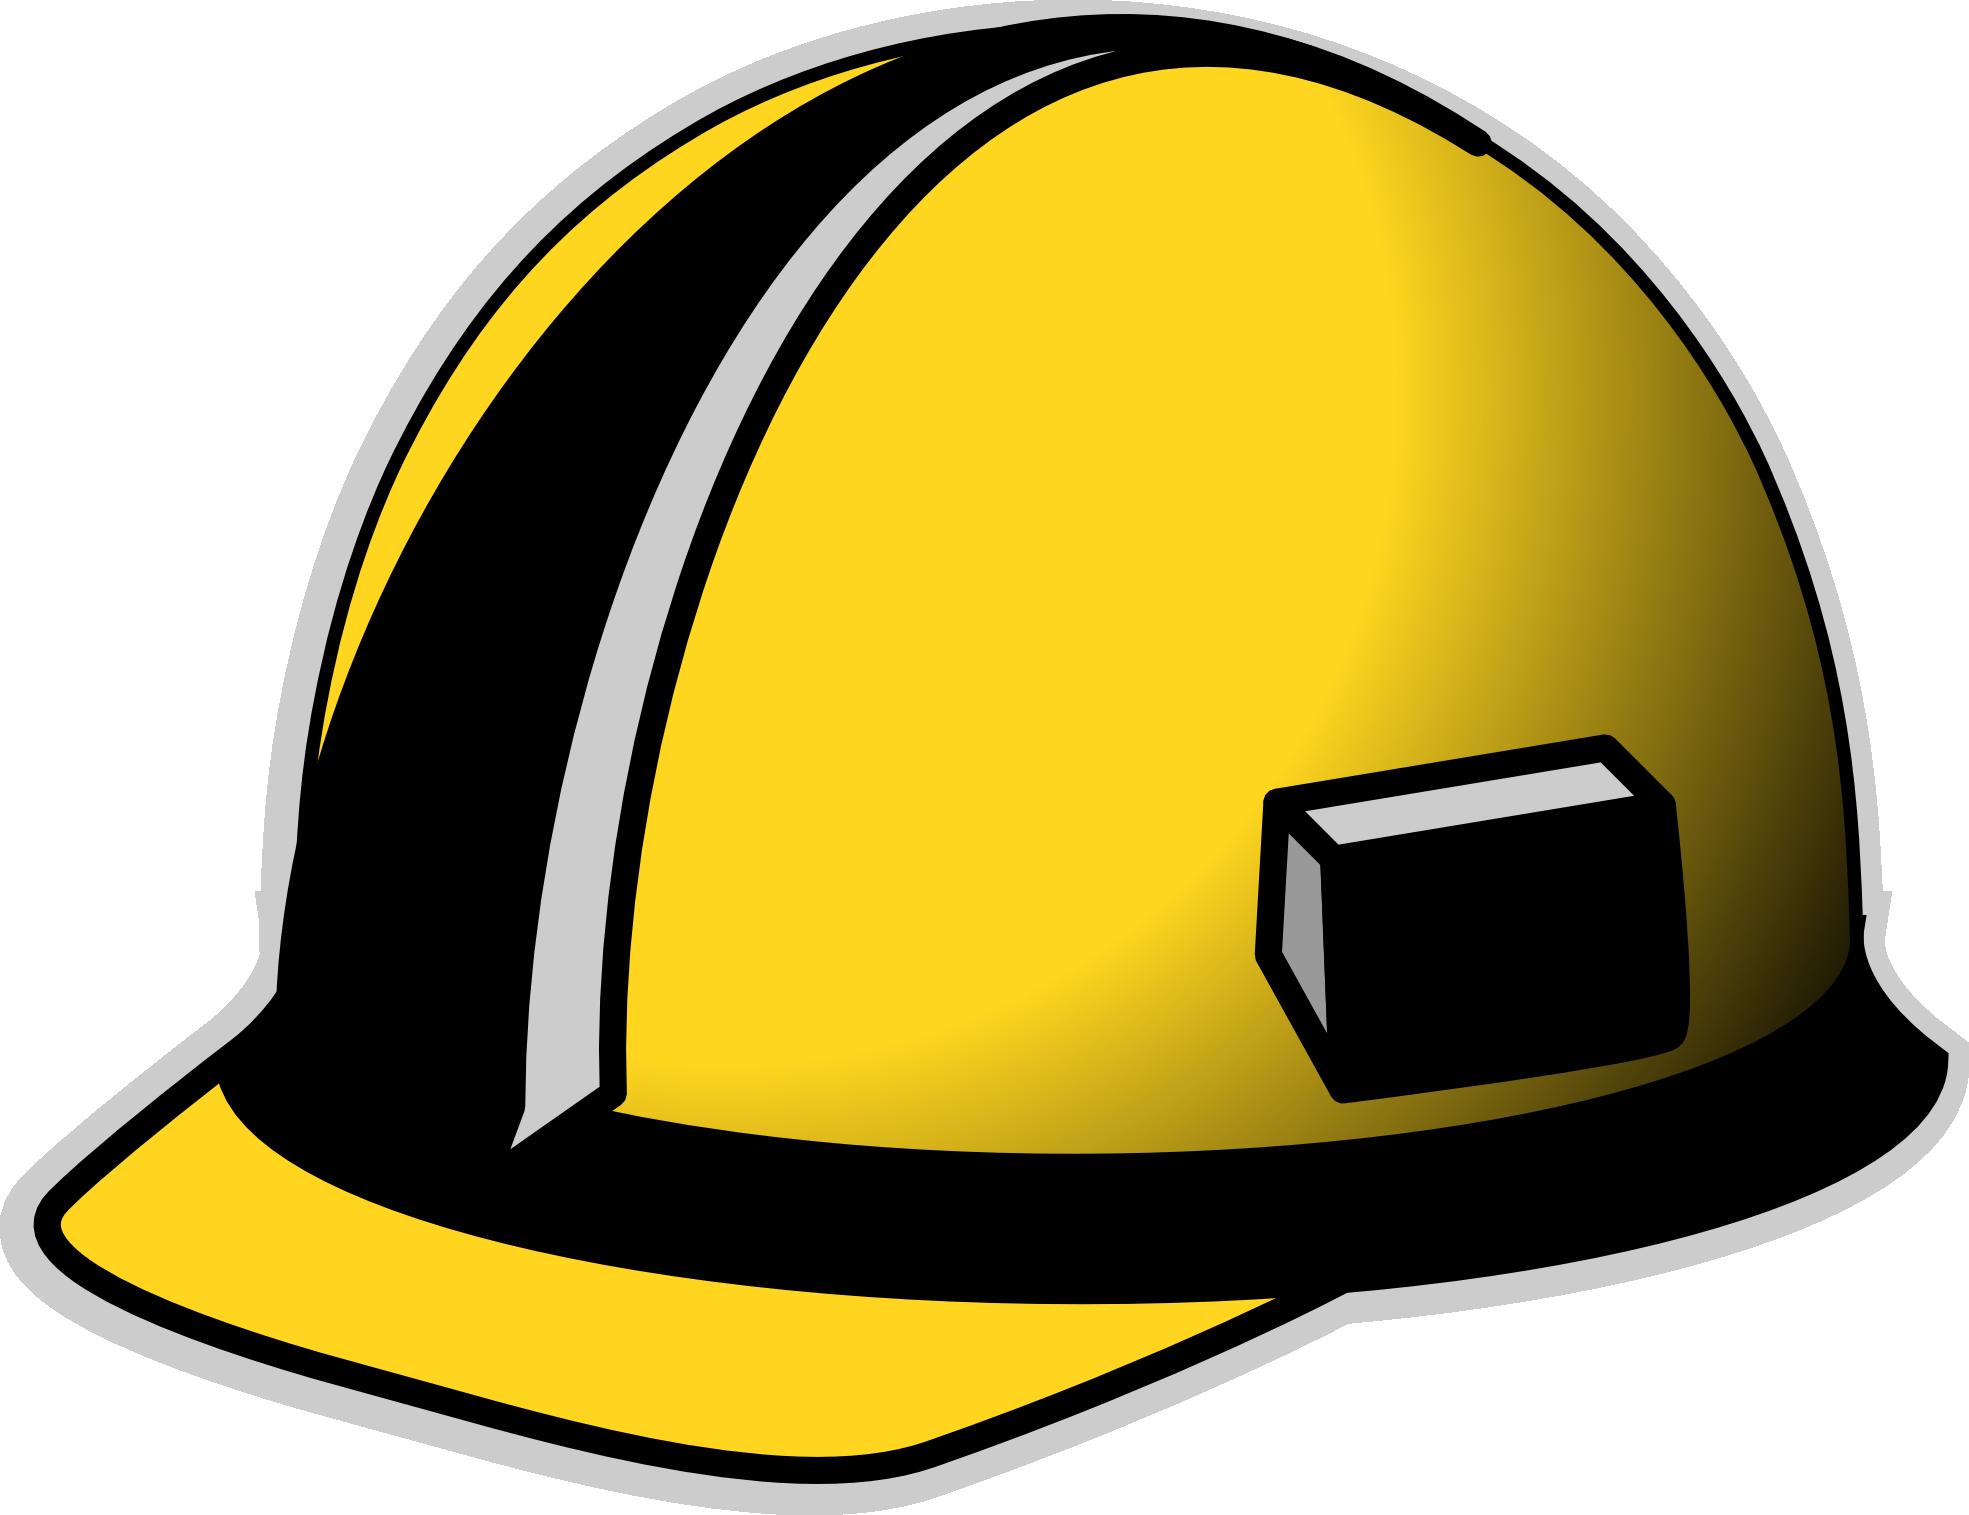 Construction Hat Clipart Clipart Panda F-Construction Hat Clipart Clipart Panda Free Clipart Images-5